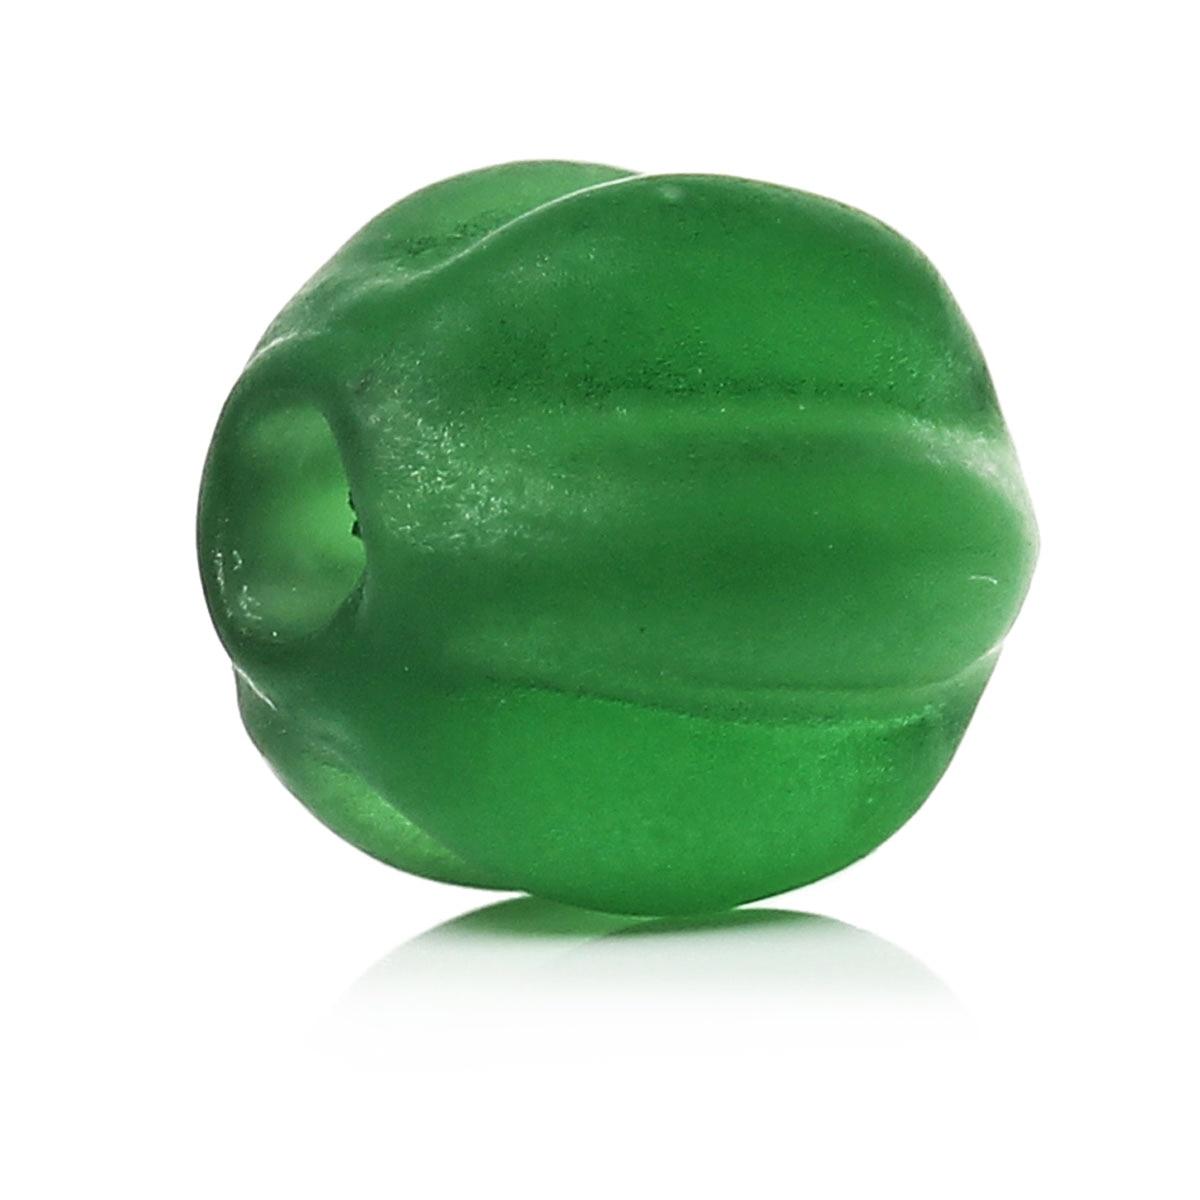 DoreenBeads Lampwork Glass Beads Pumpkin Shape Green Frosted About 8mm( 38) x 8mm( 38), Hole: Approx 2mm, 50 PCs